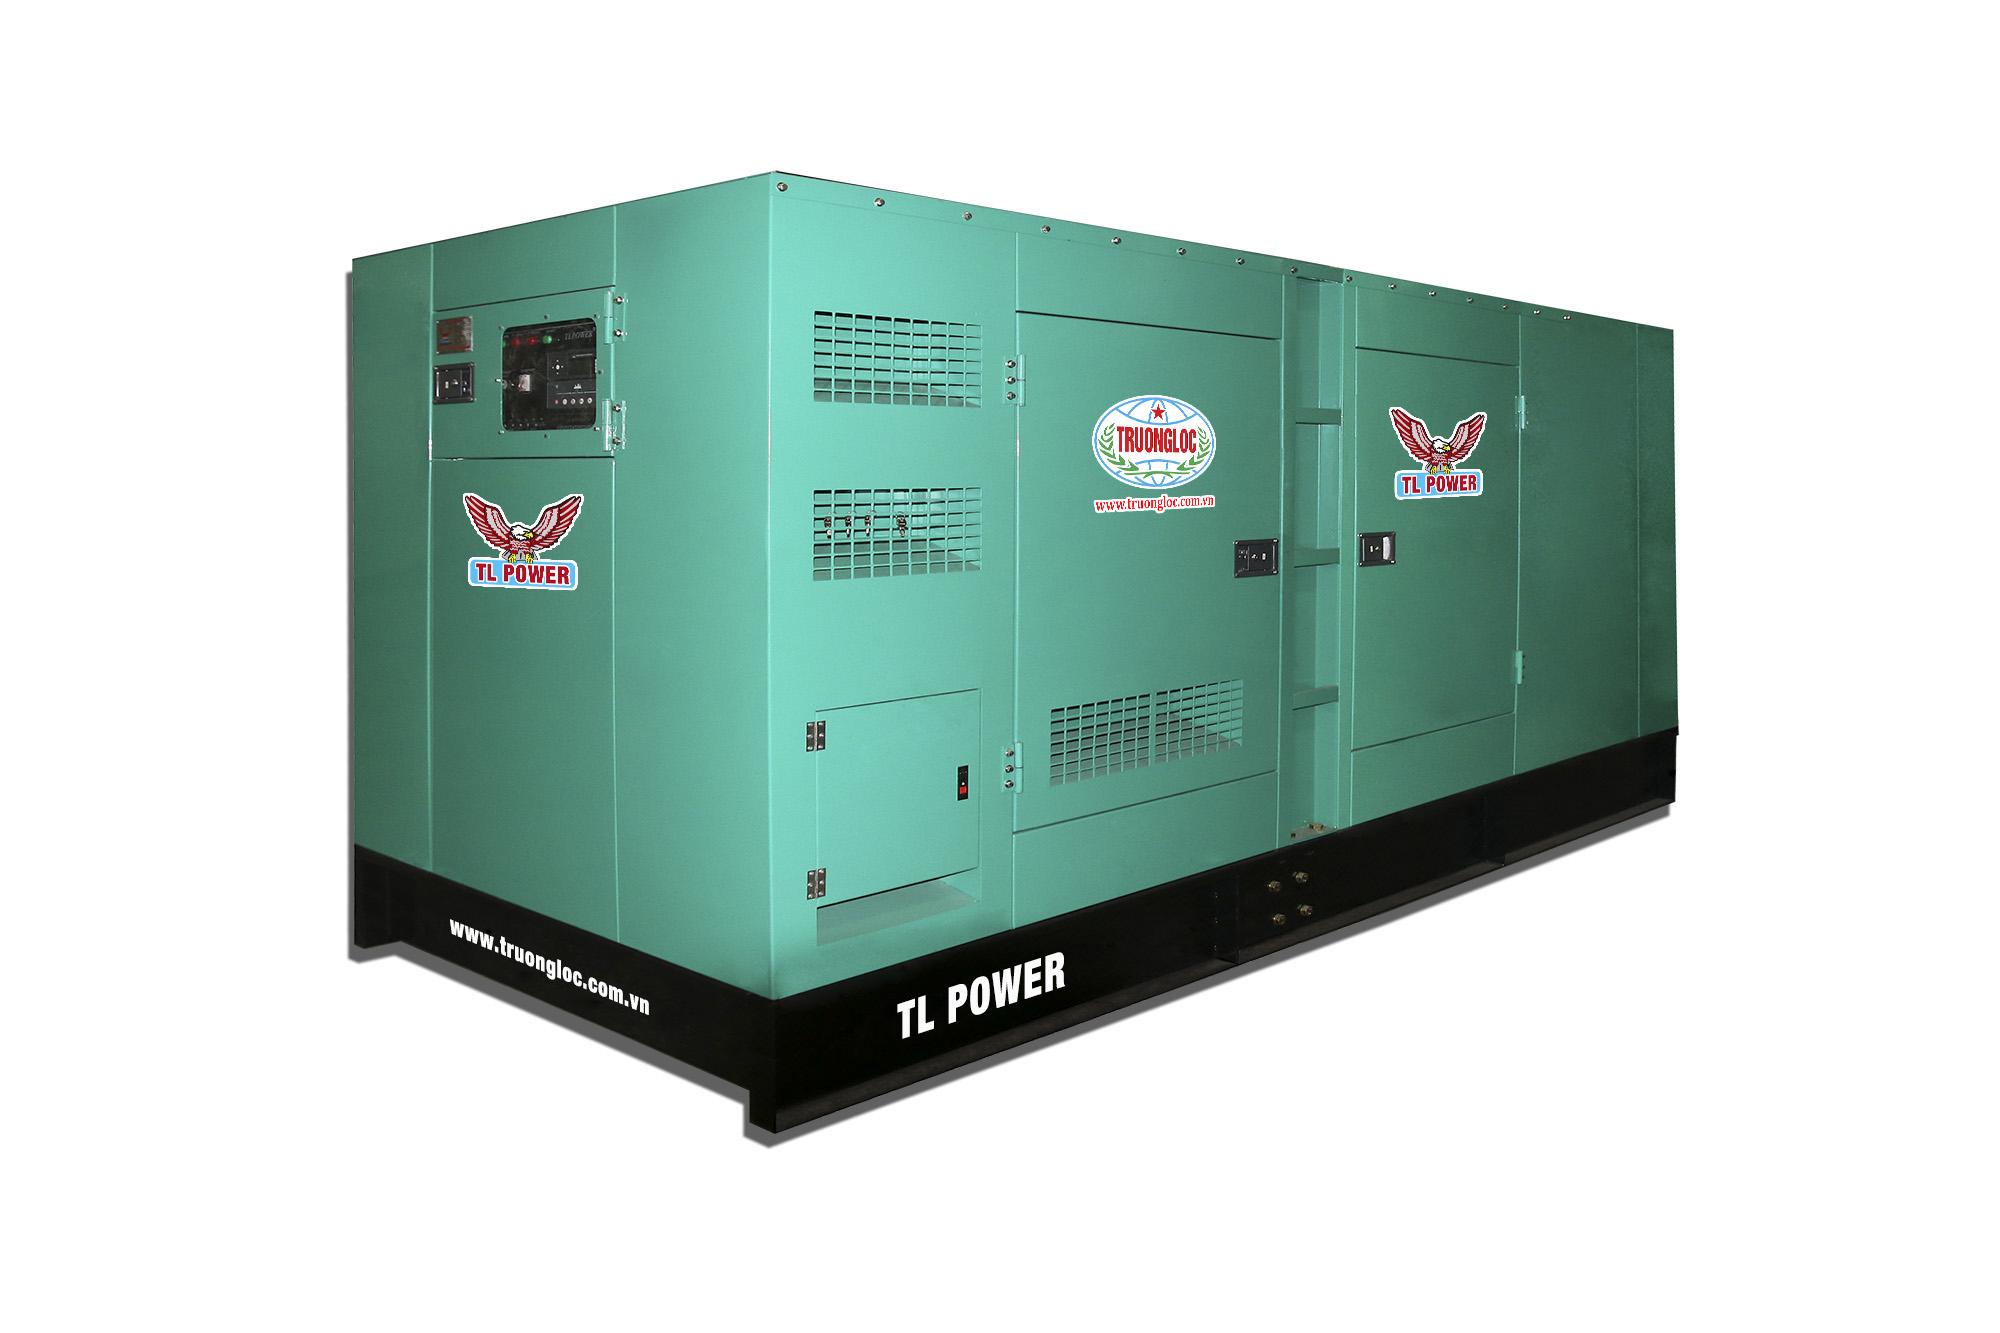 TLPOWER TP66-LS - PERKINS ENGINE